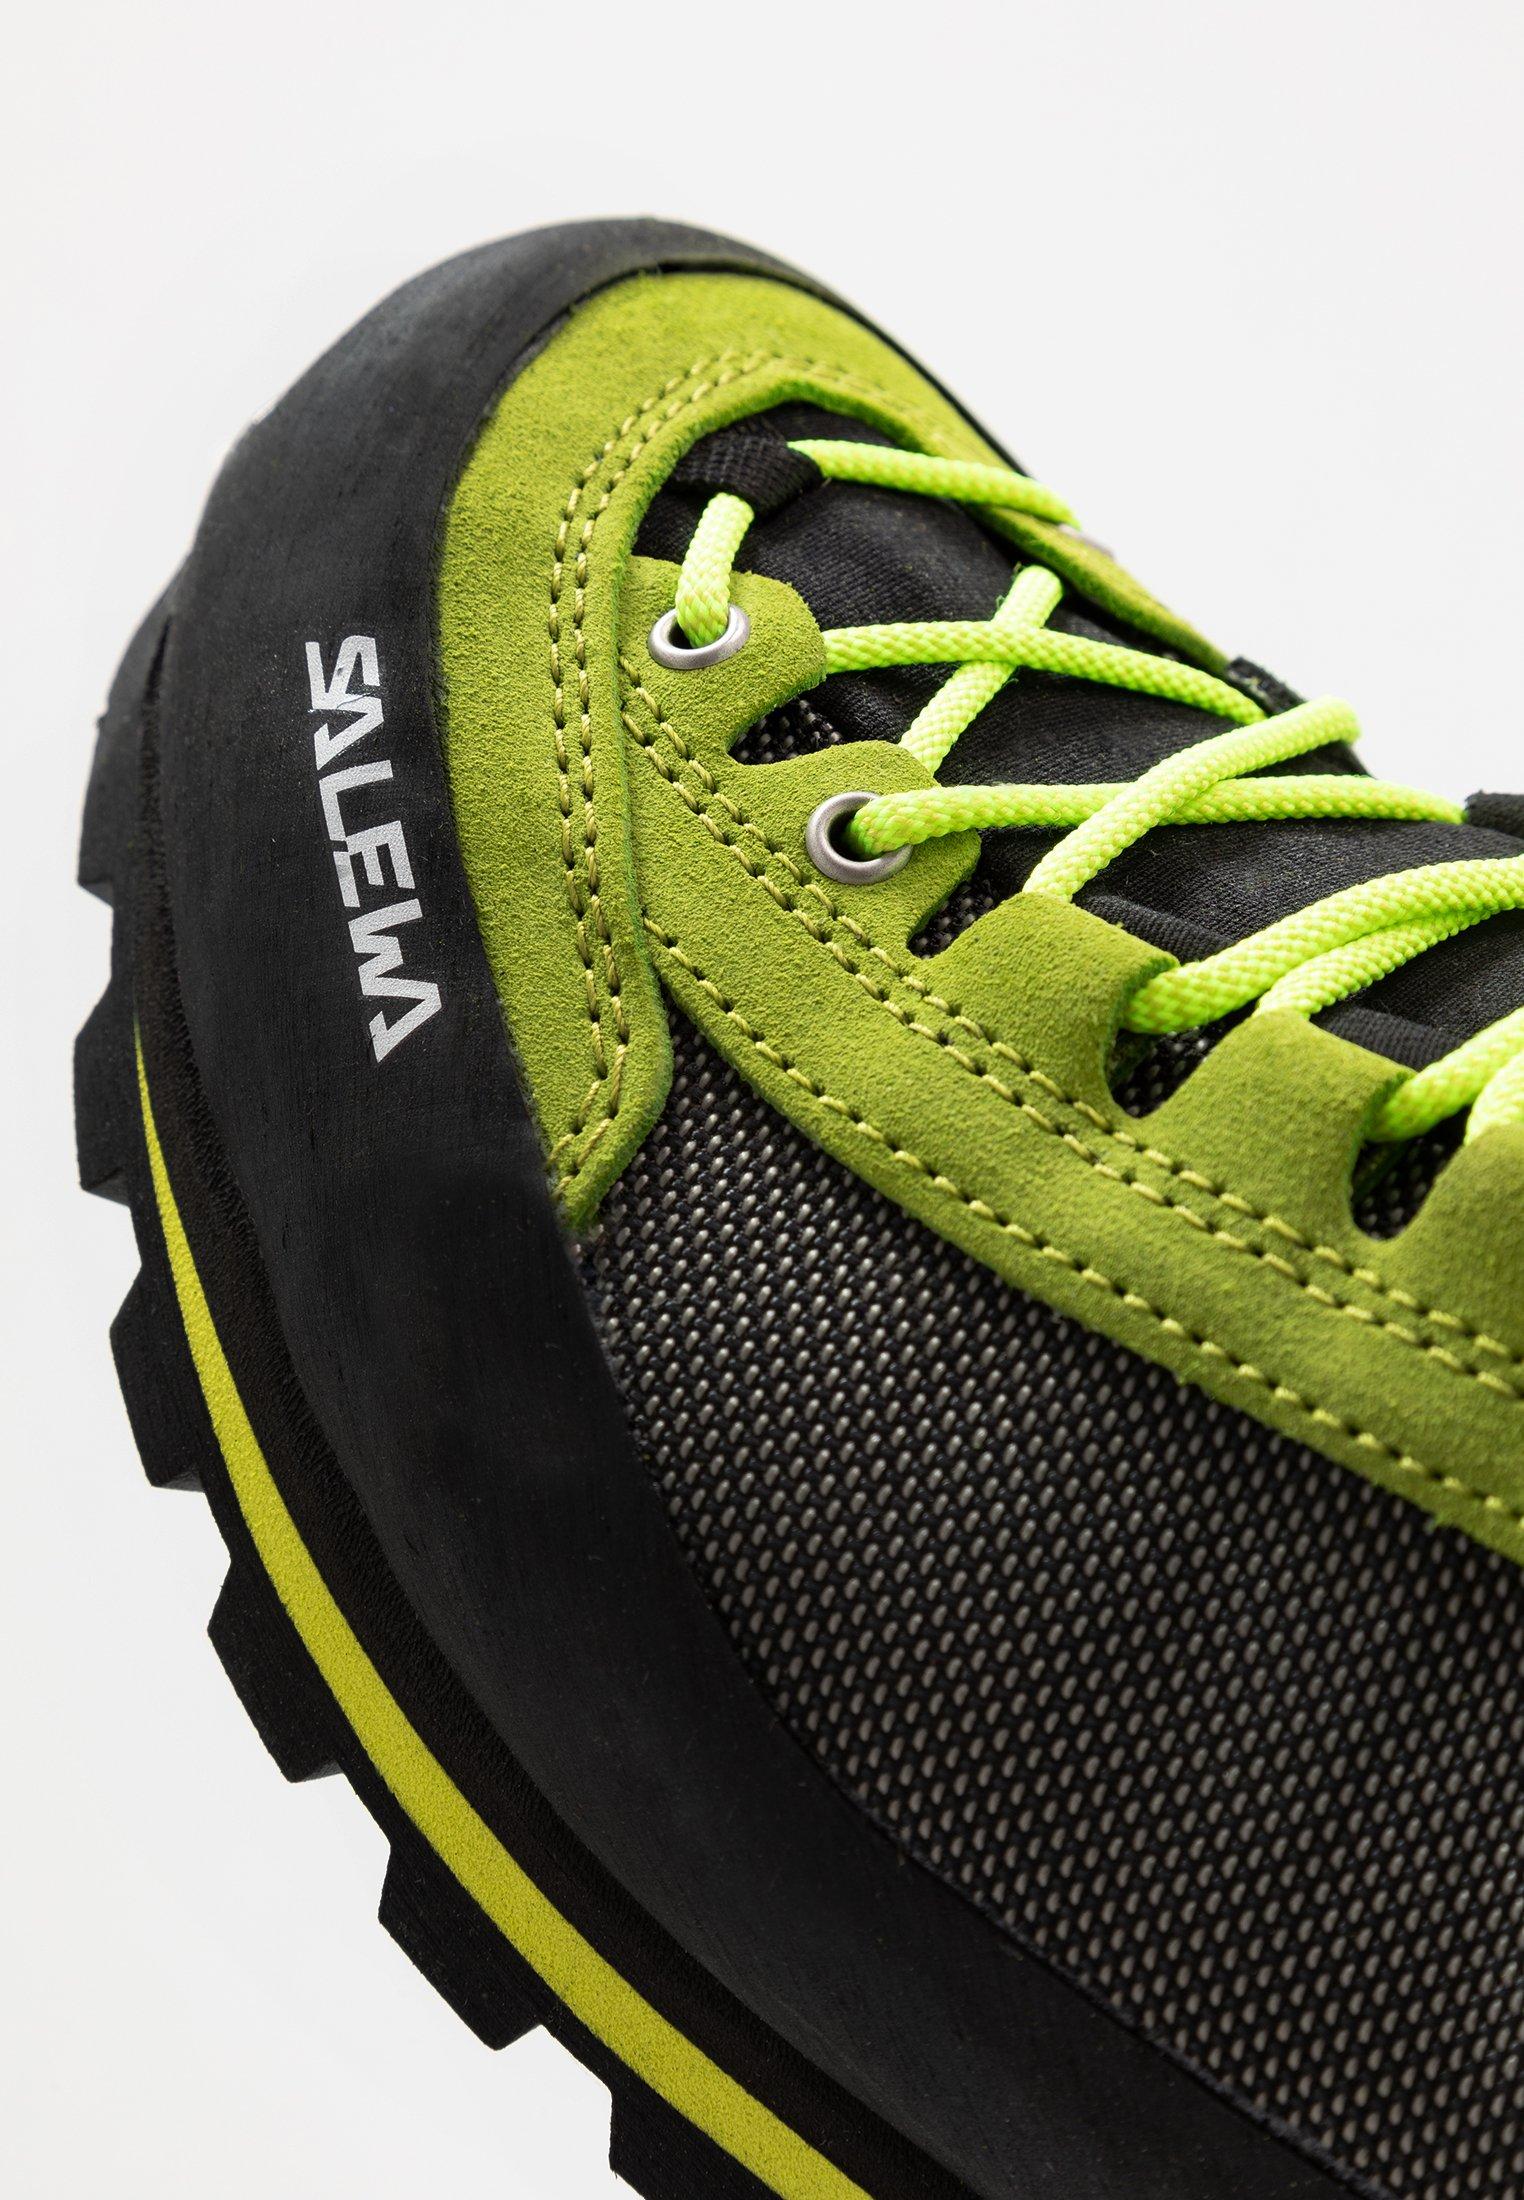 Scarpe da uomo Salewa CROW GTX Scarponi da montagna cactus/sulphur spring